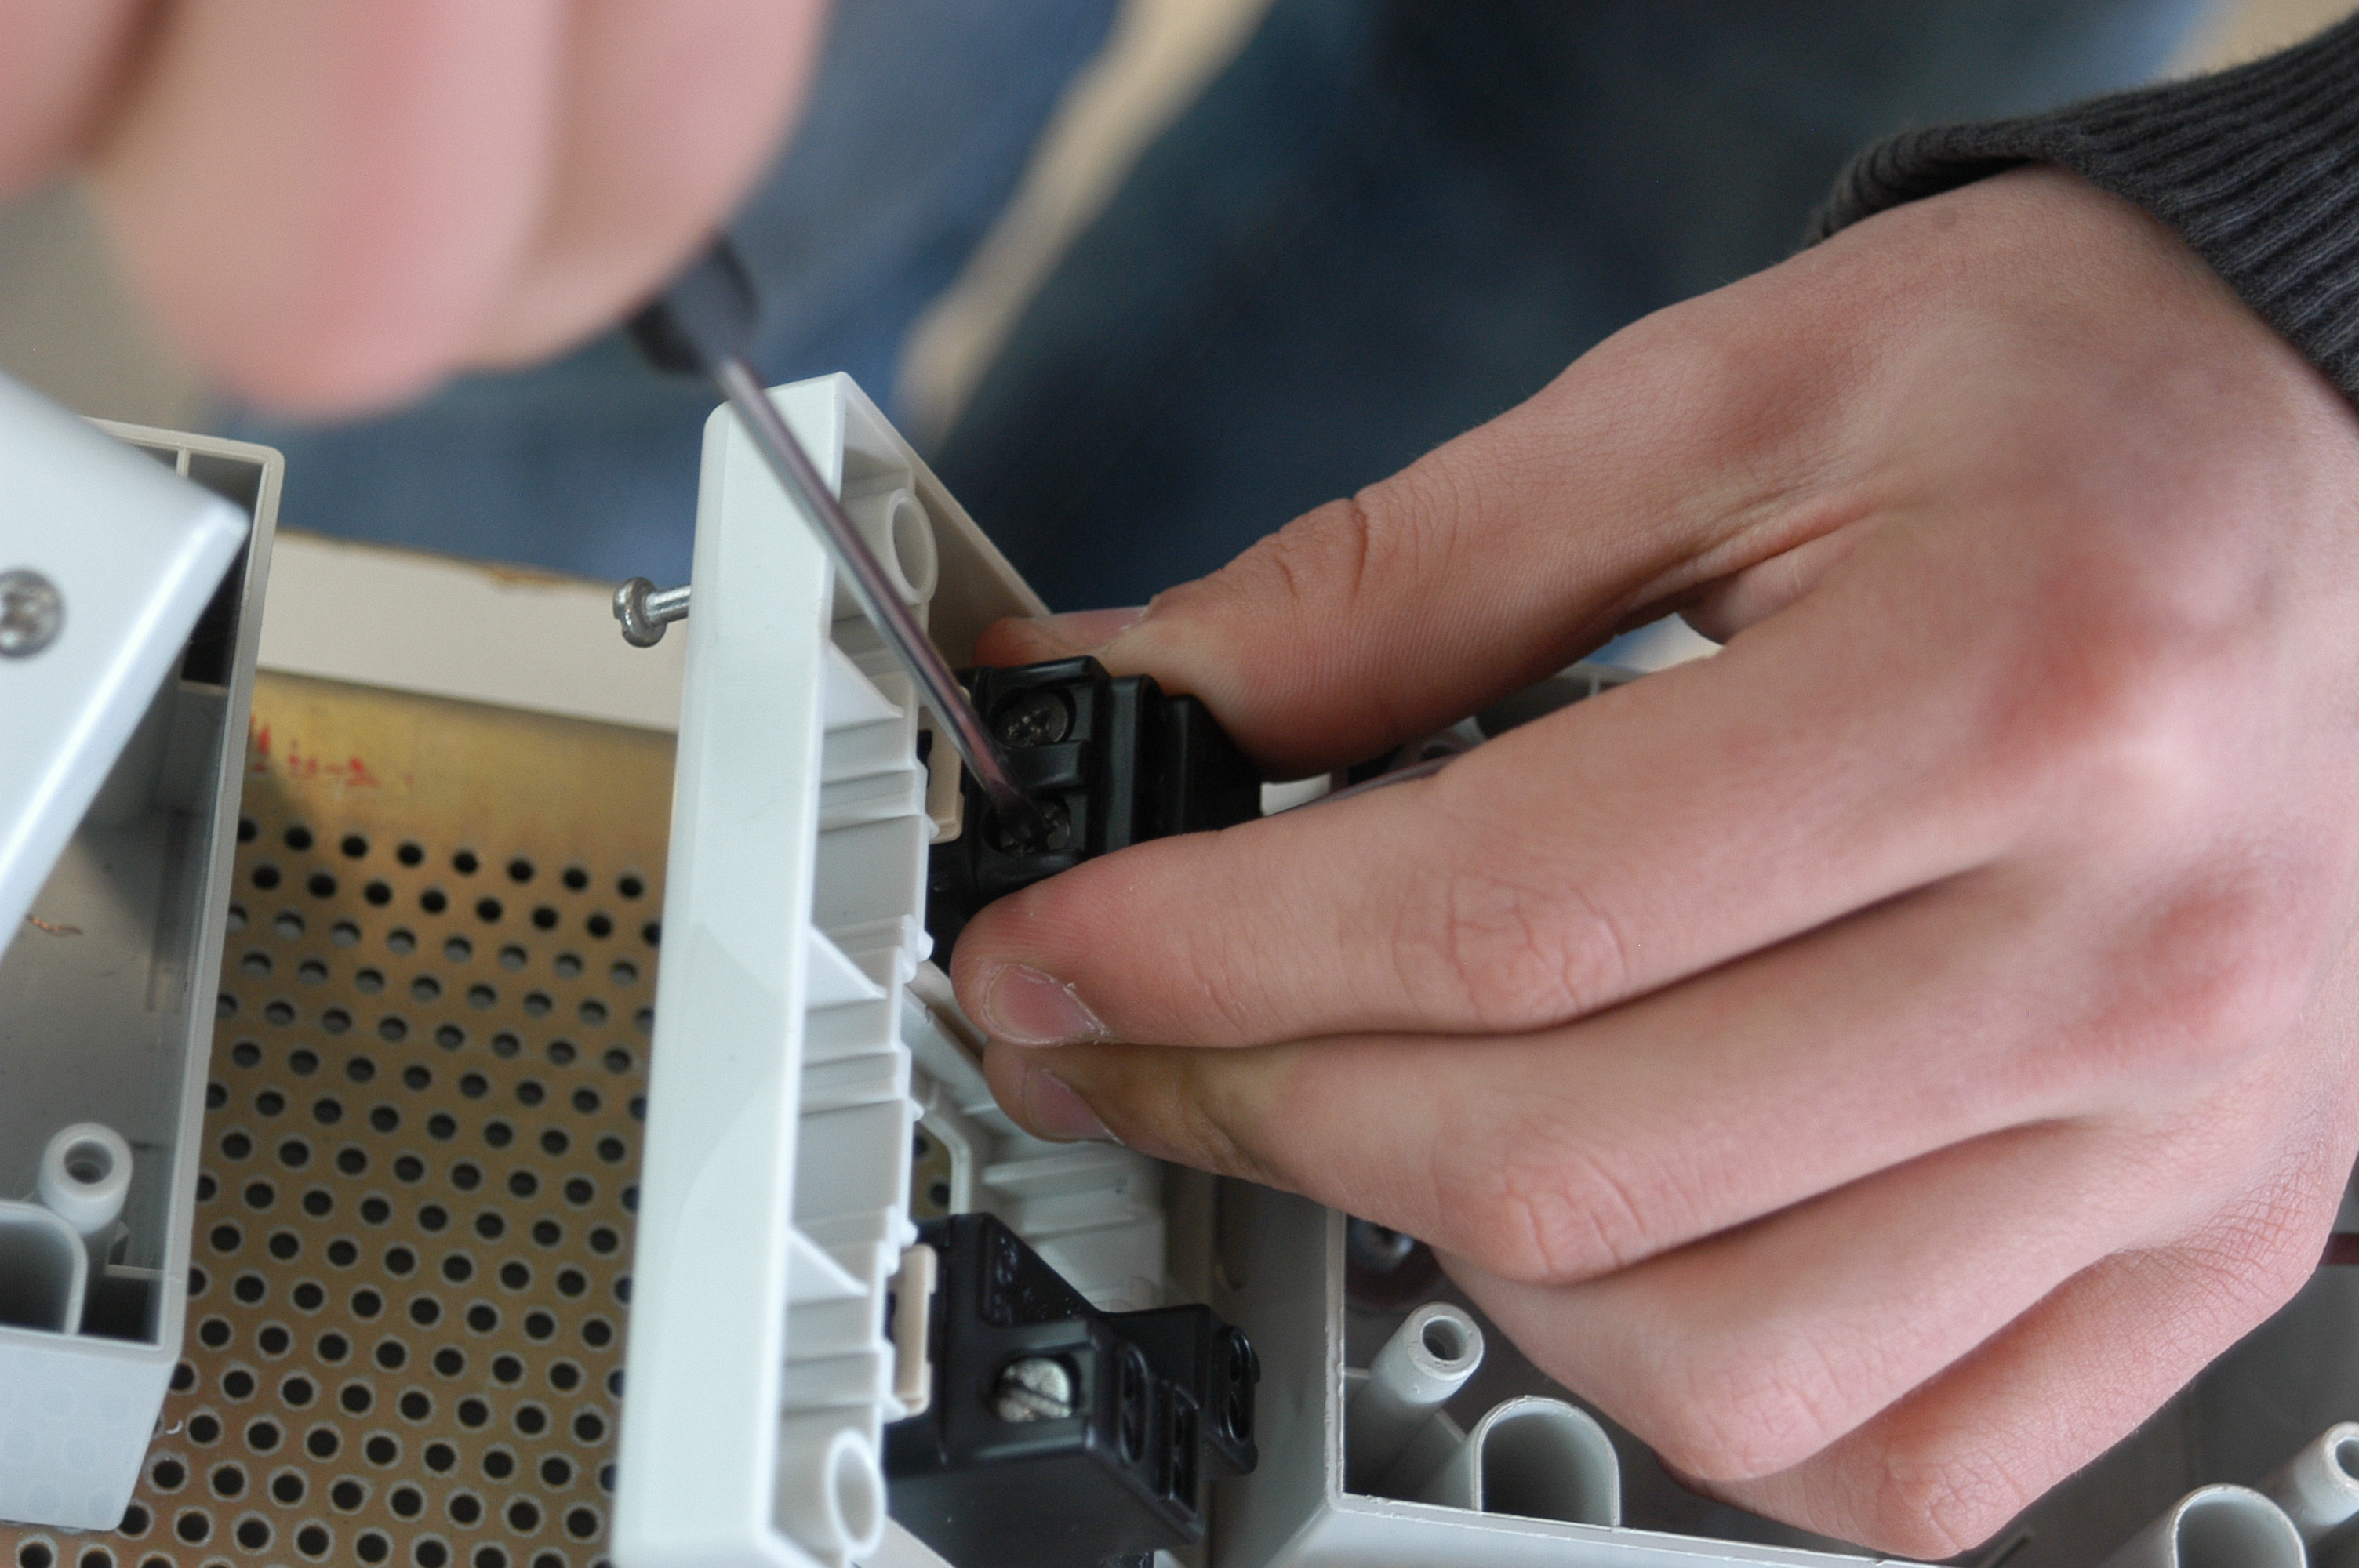 Operatore elettrico - biennale